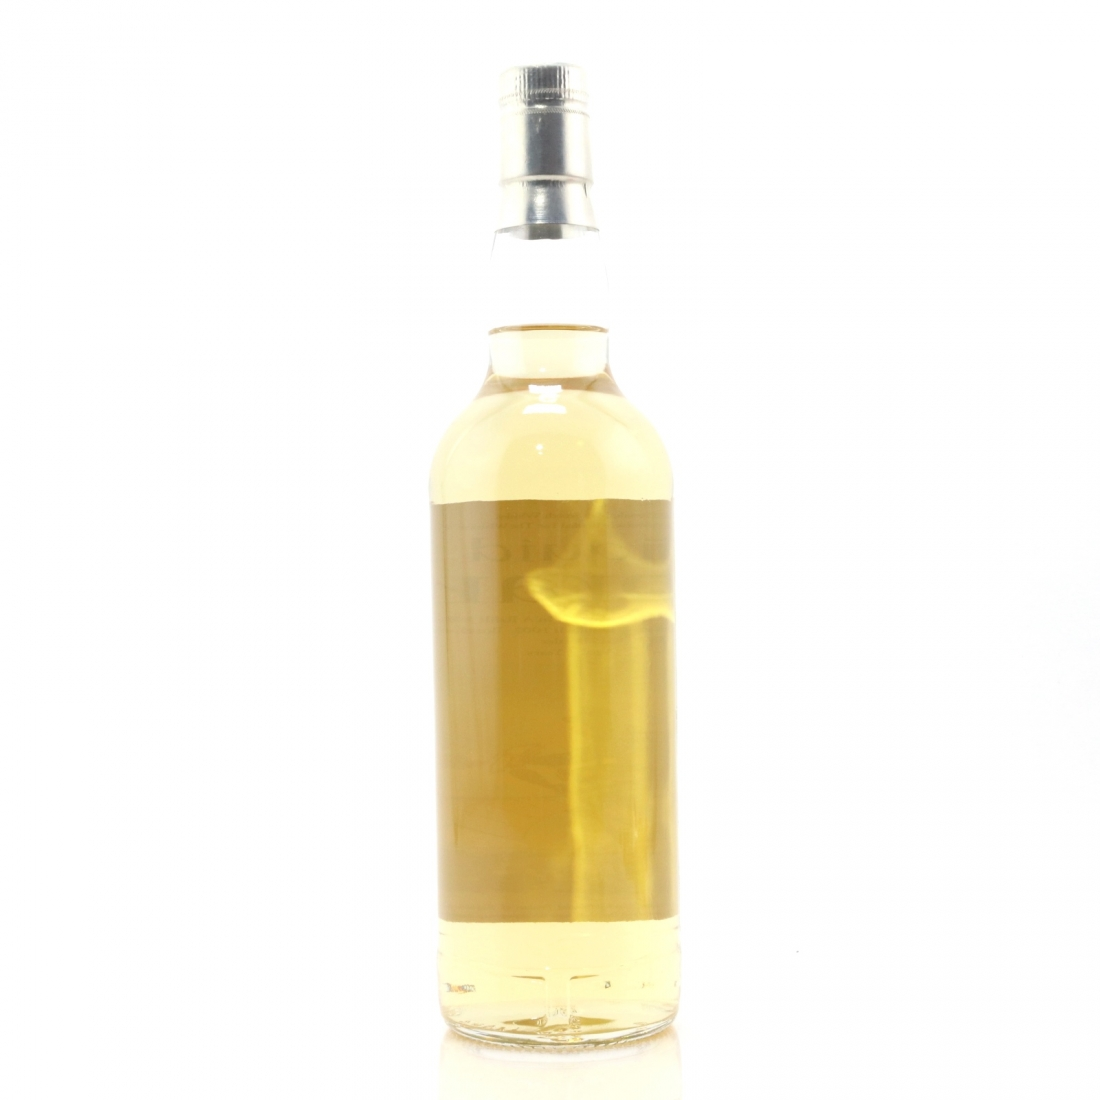 Islay Single Malt 2007 Whisky Agency 7 Year Old / Liquid Library